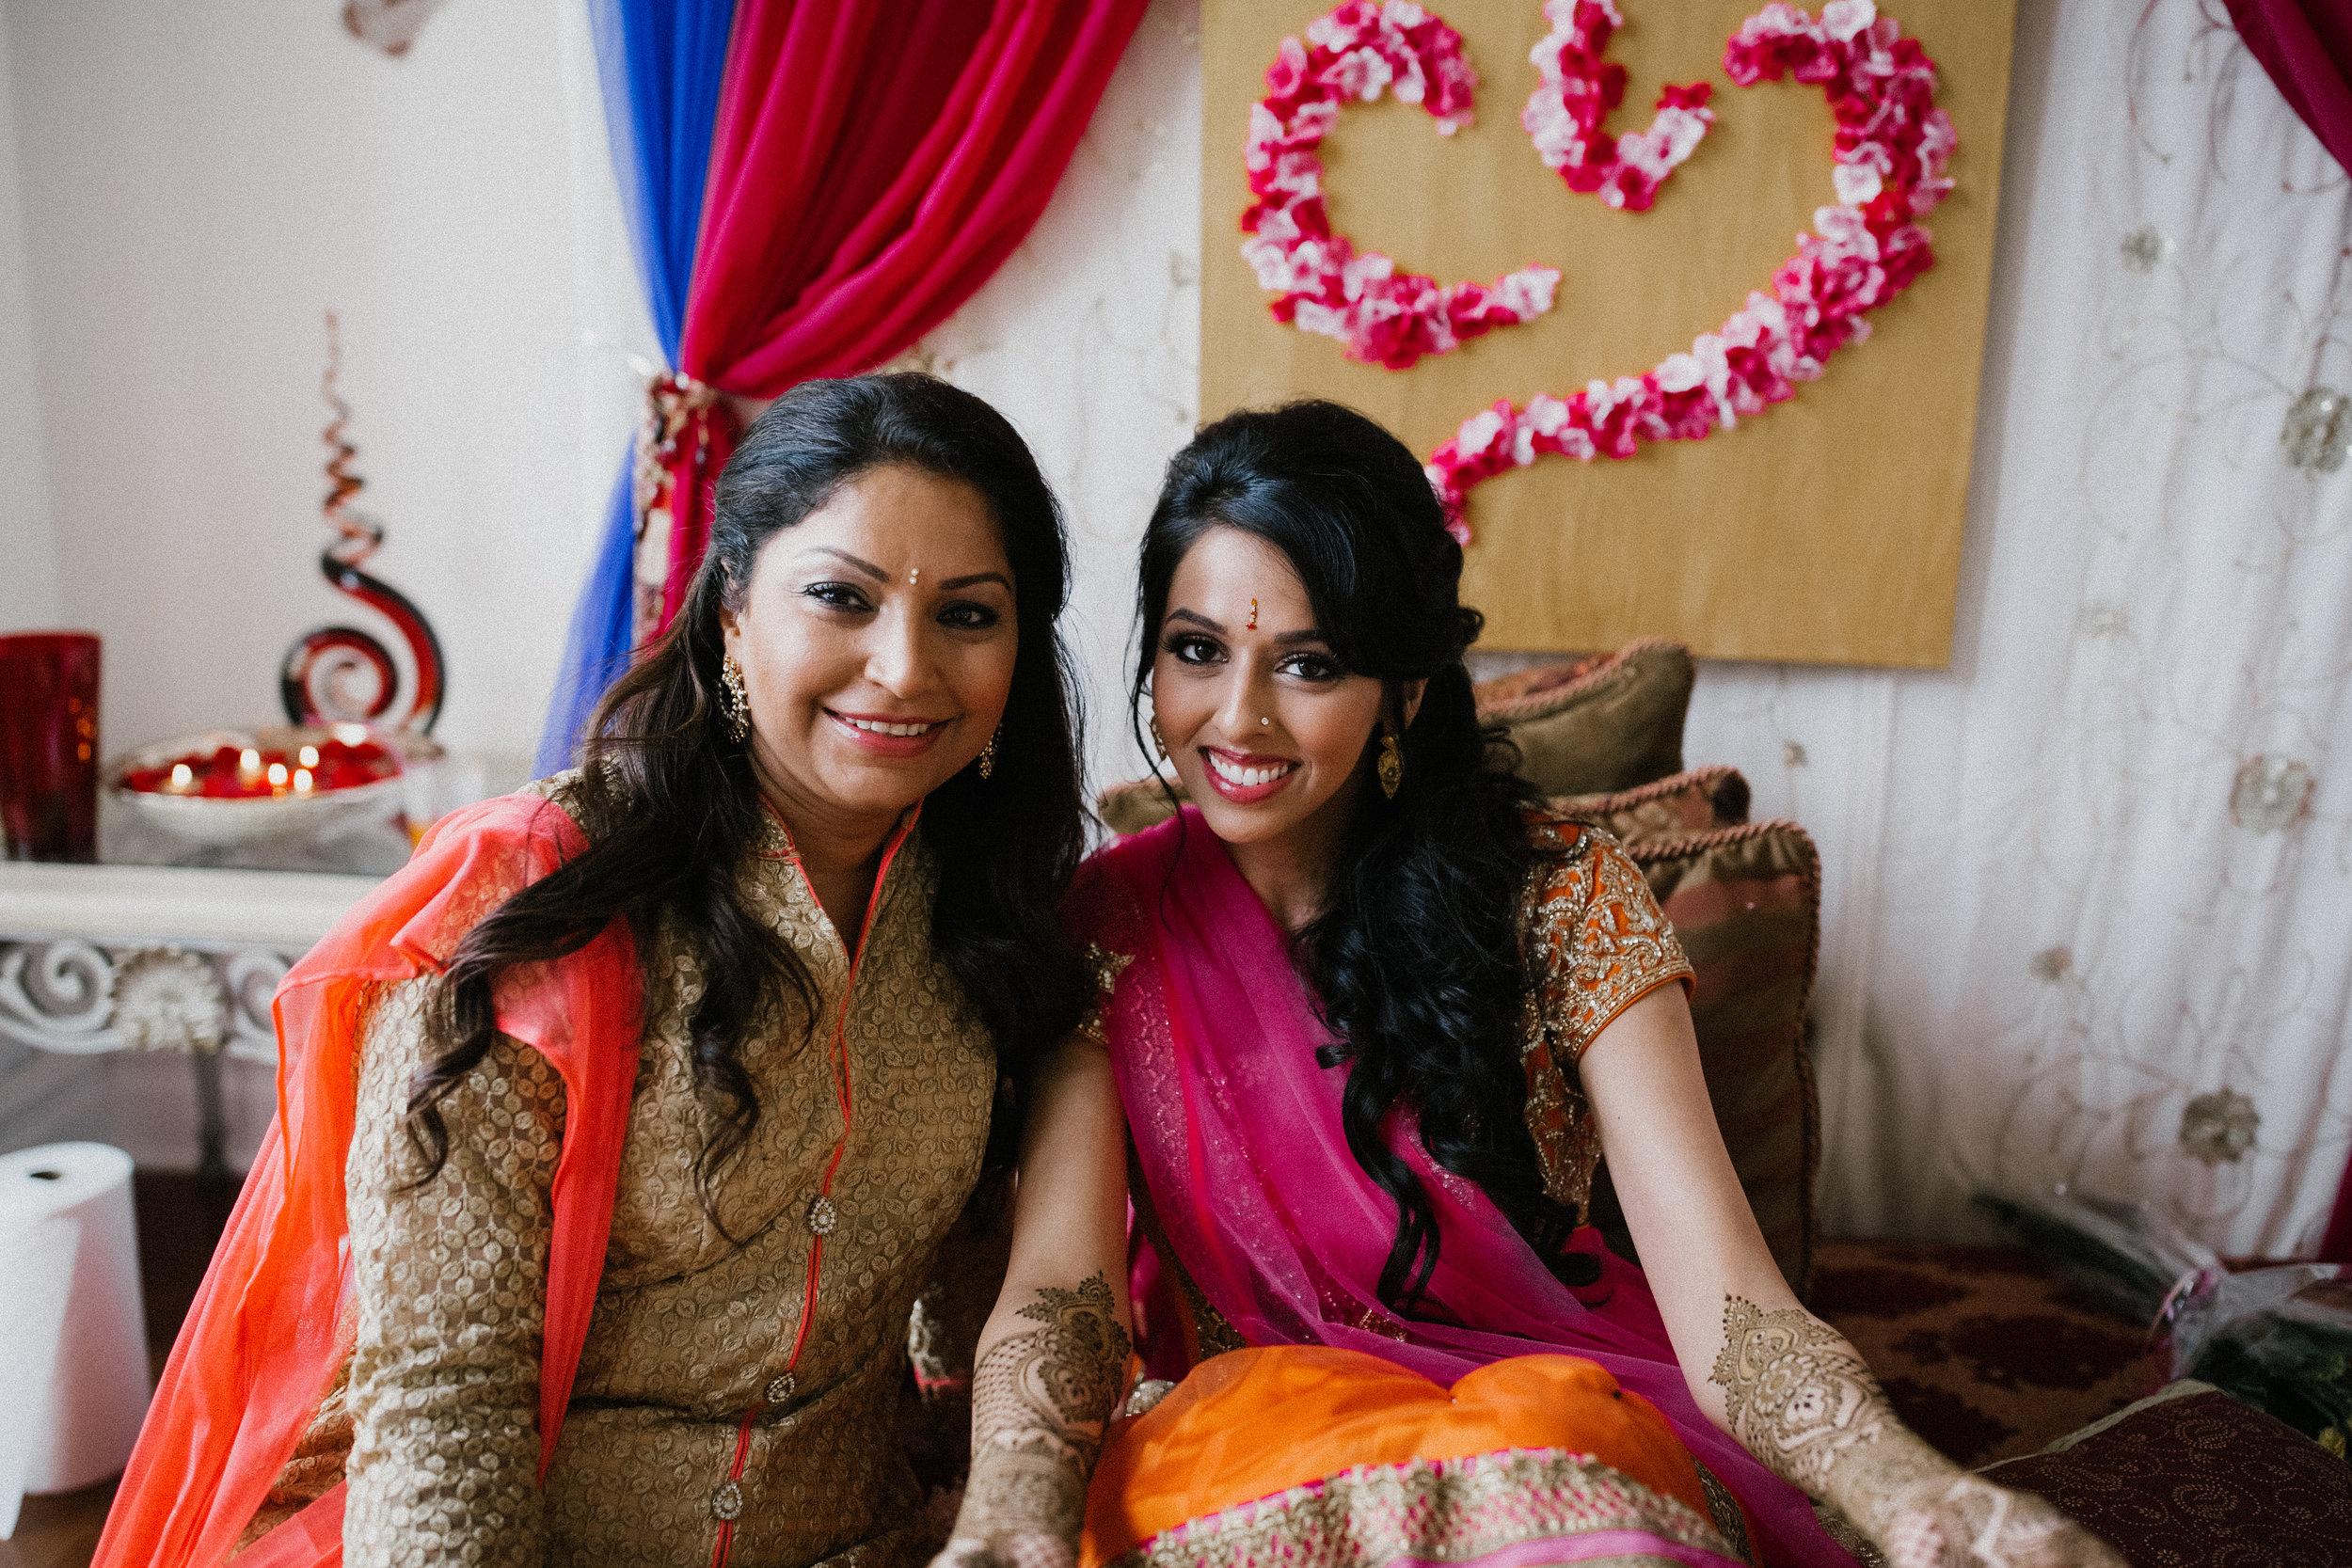 Aparna-Ankit-Patel-Mehndi-Wedding-Photos-0030.jpg